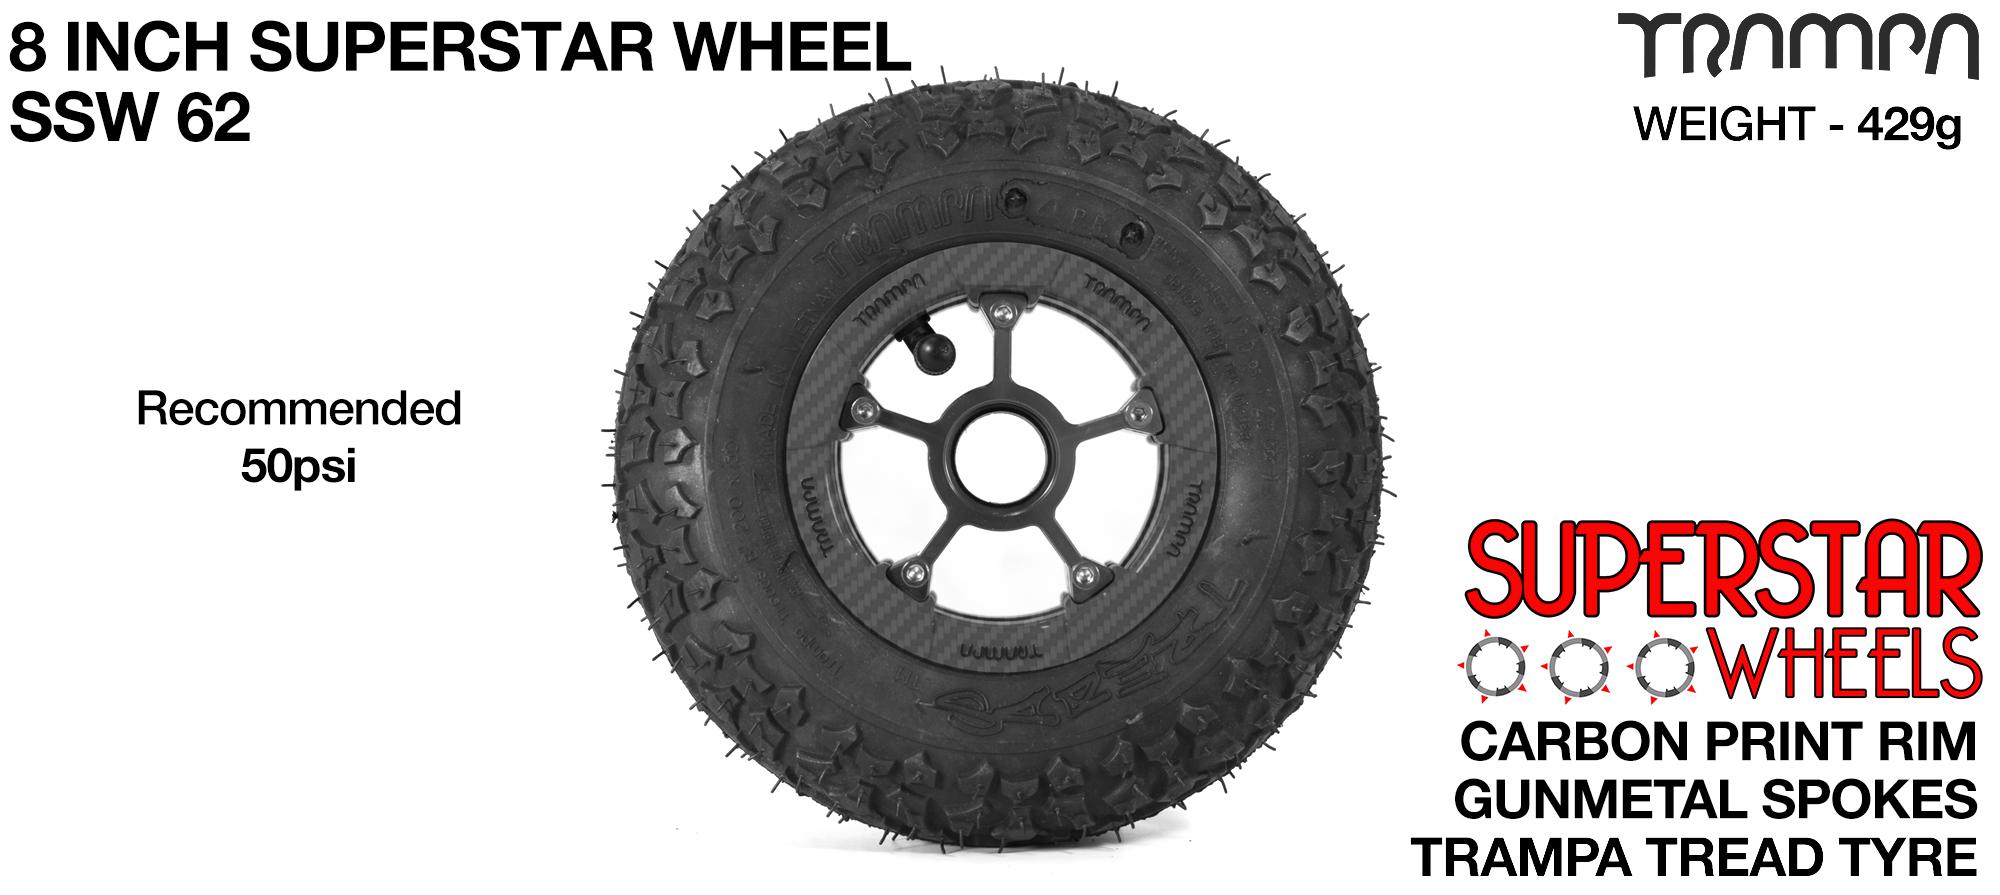 Superstar 8 inch wheel - Carbon Print Rim with Gunmetal Anodised spokes & TRAMPA TREAD 8 Inch Tyres